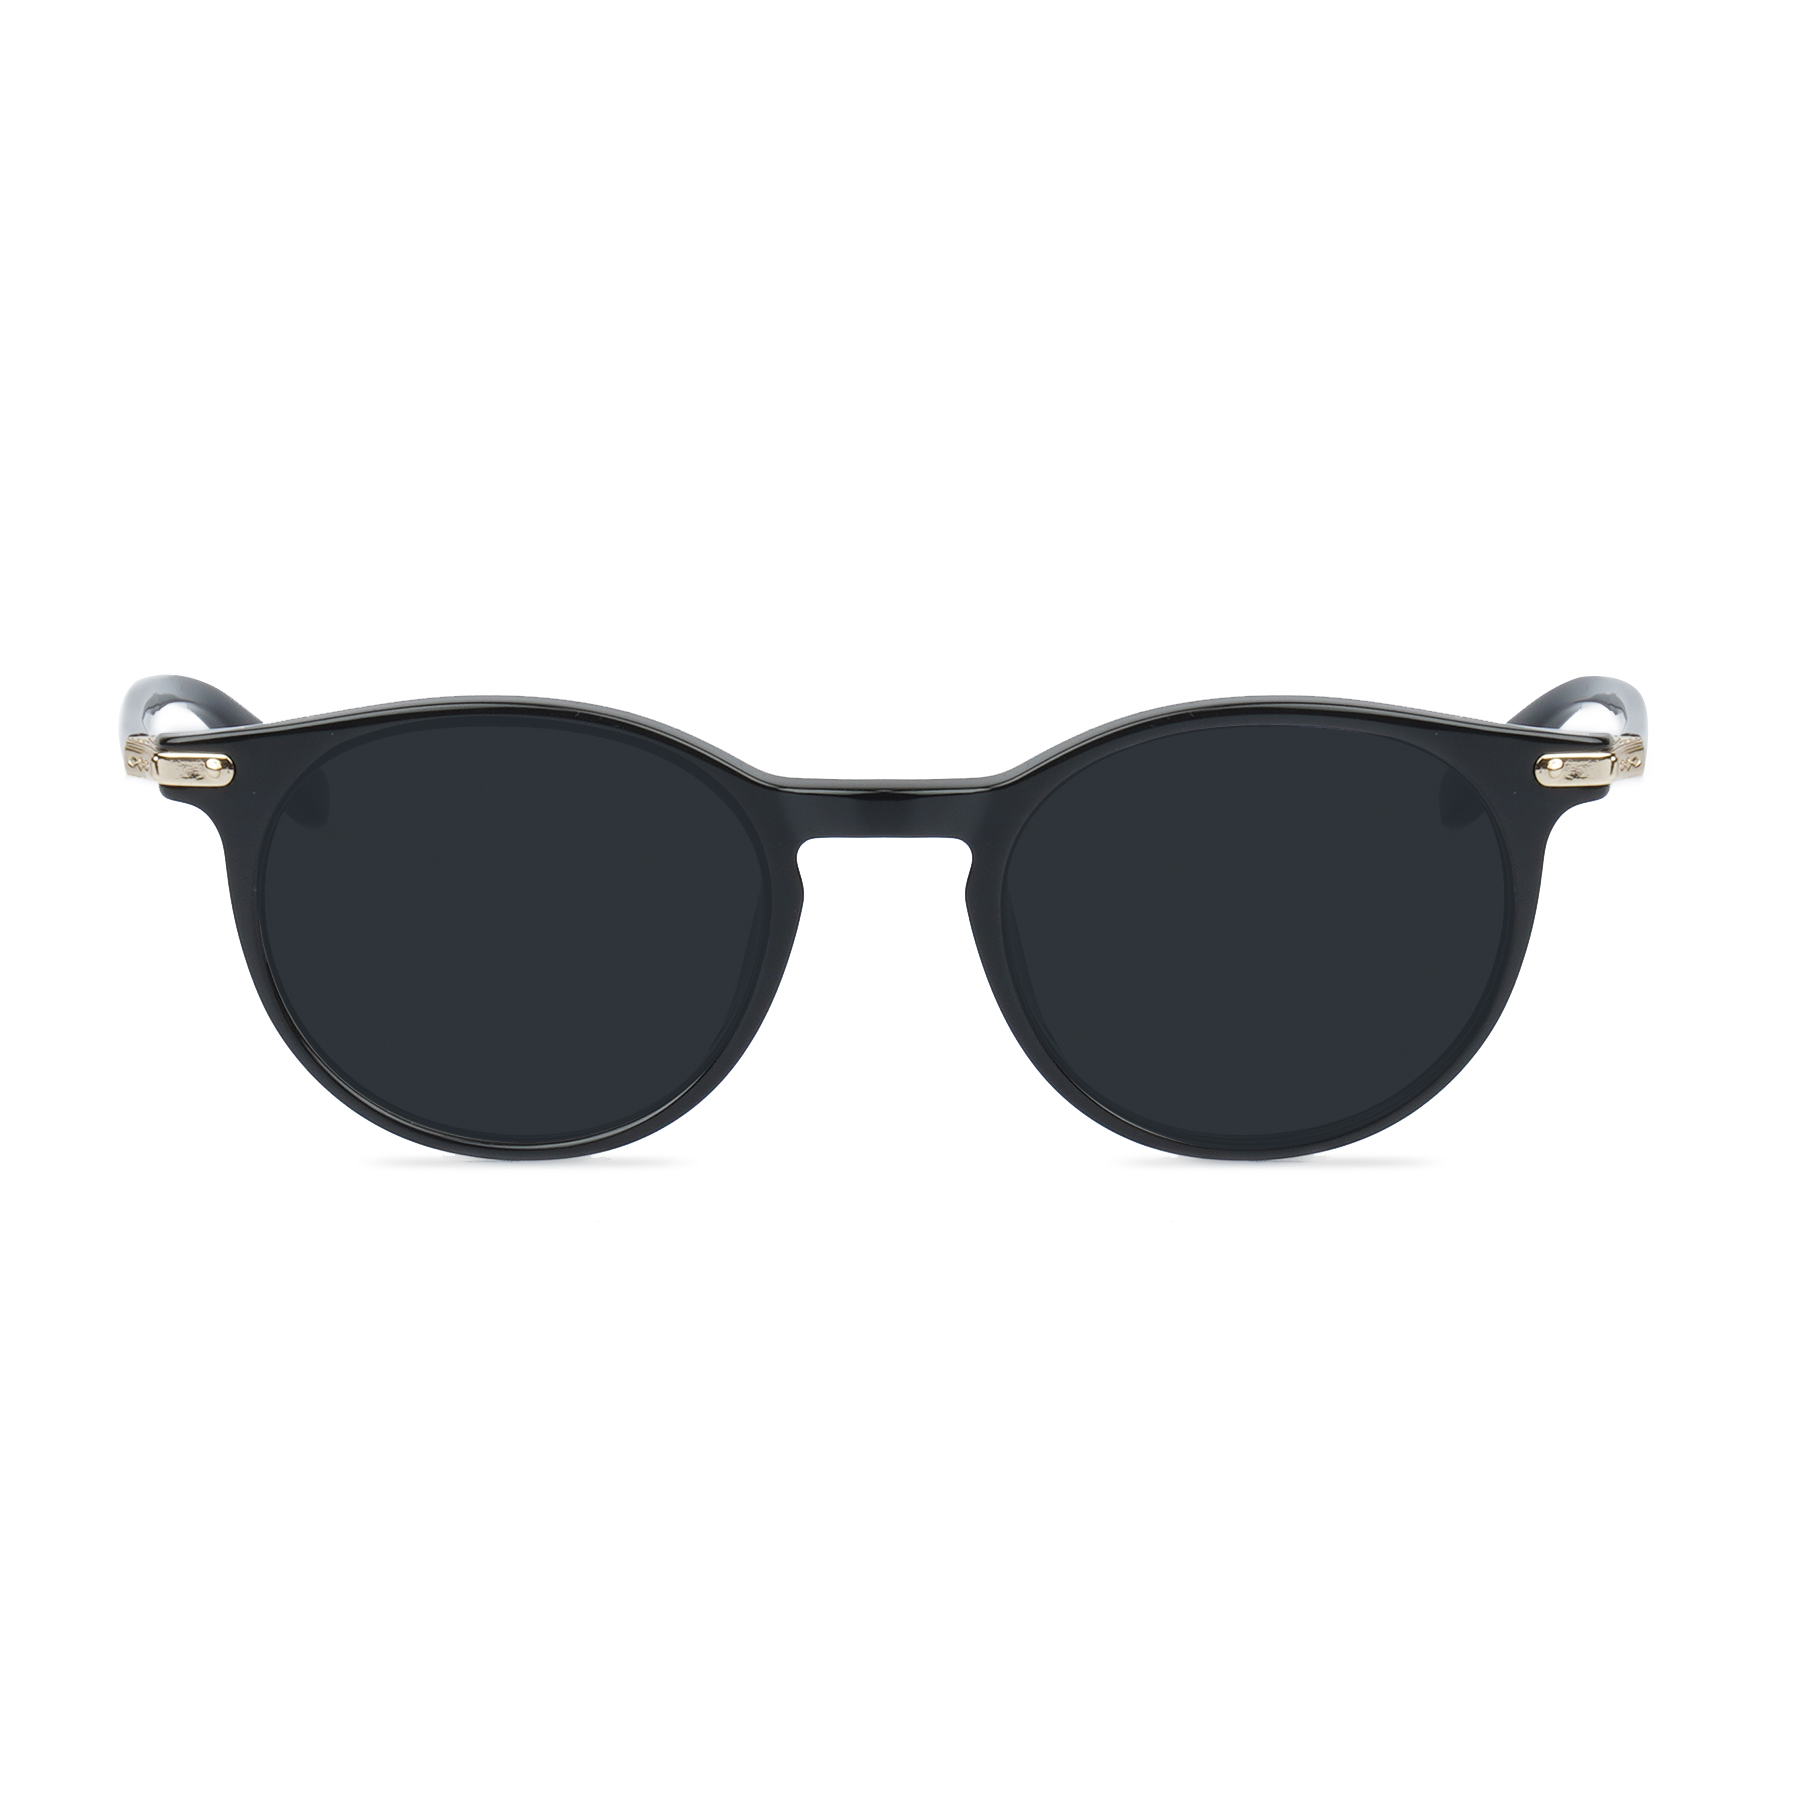 Evoke Zurich Sunglasses